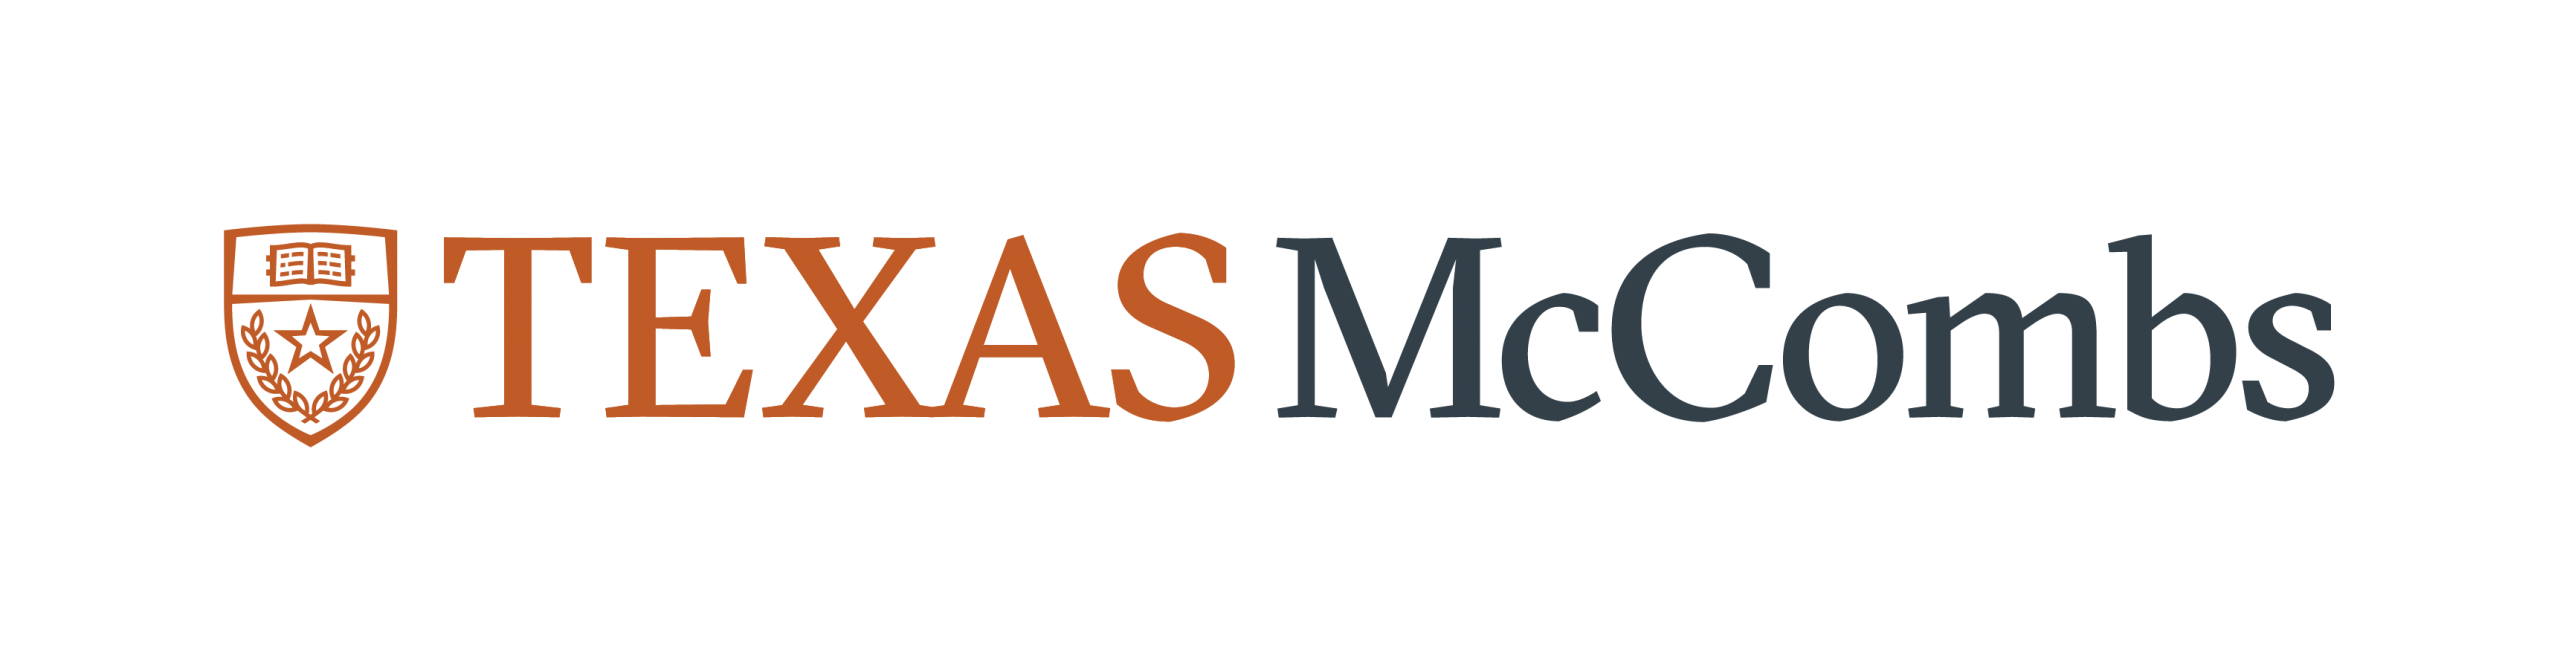 McCombs Entrepreneurship Minor